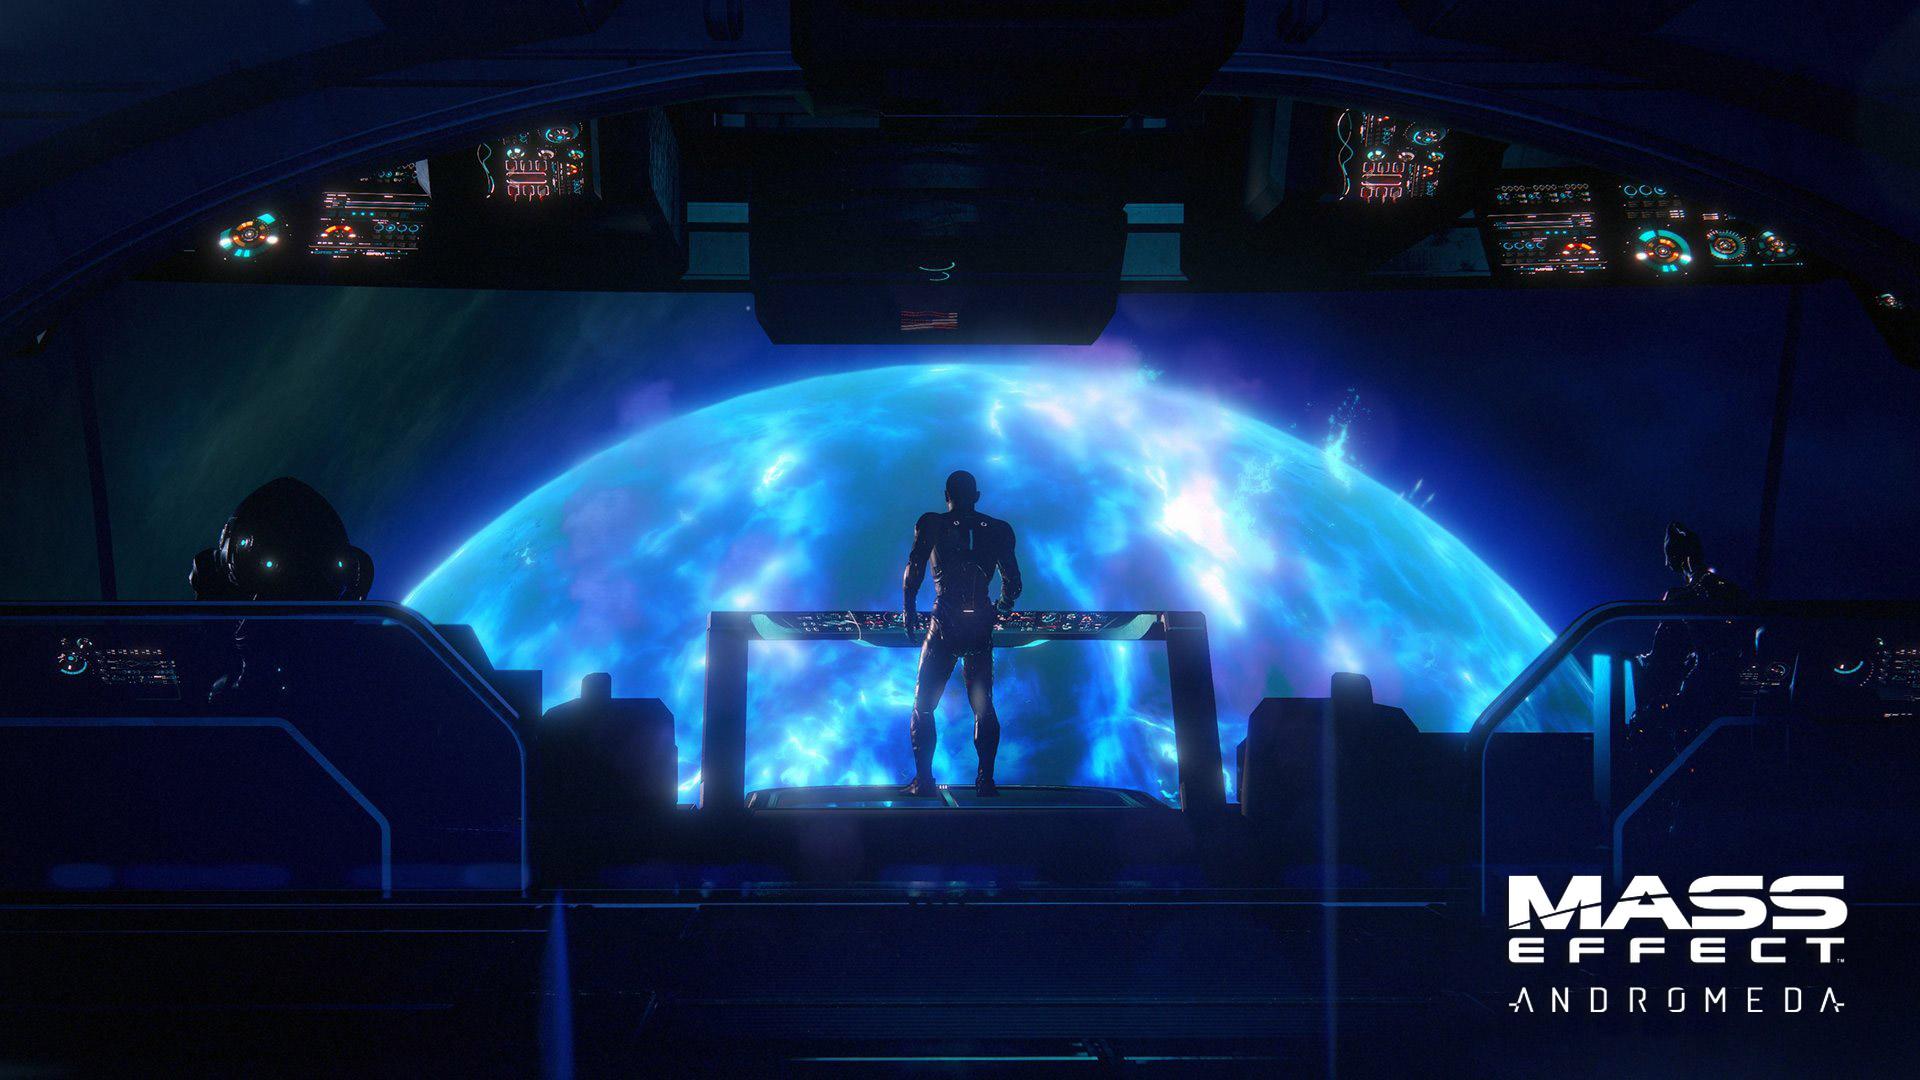 Mass Effect Andromeda wallpaper 4